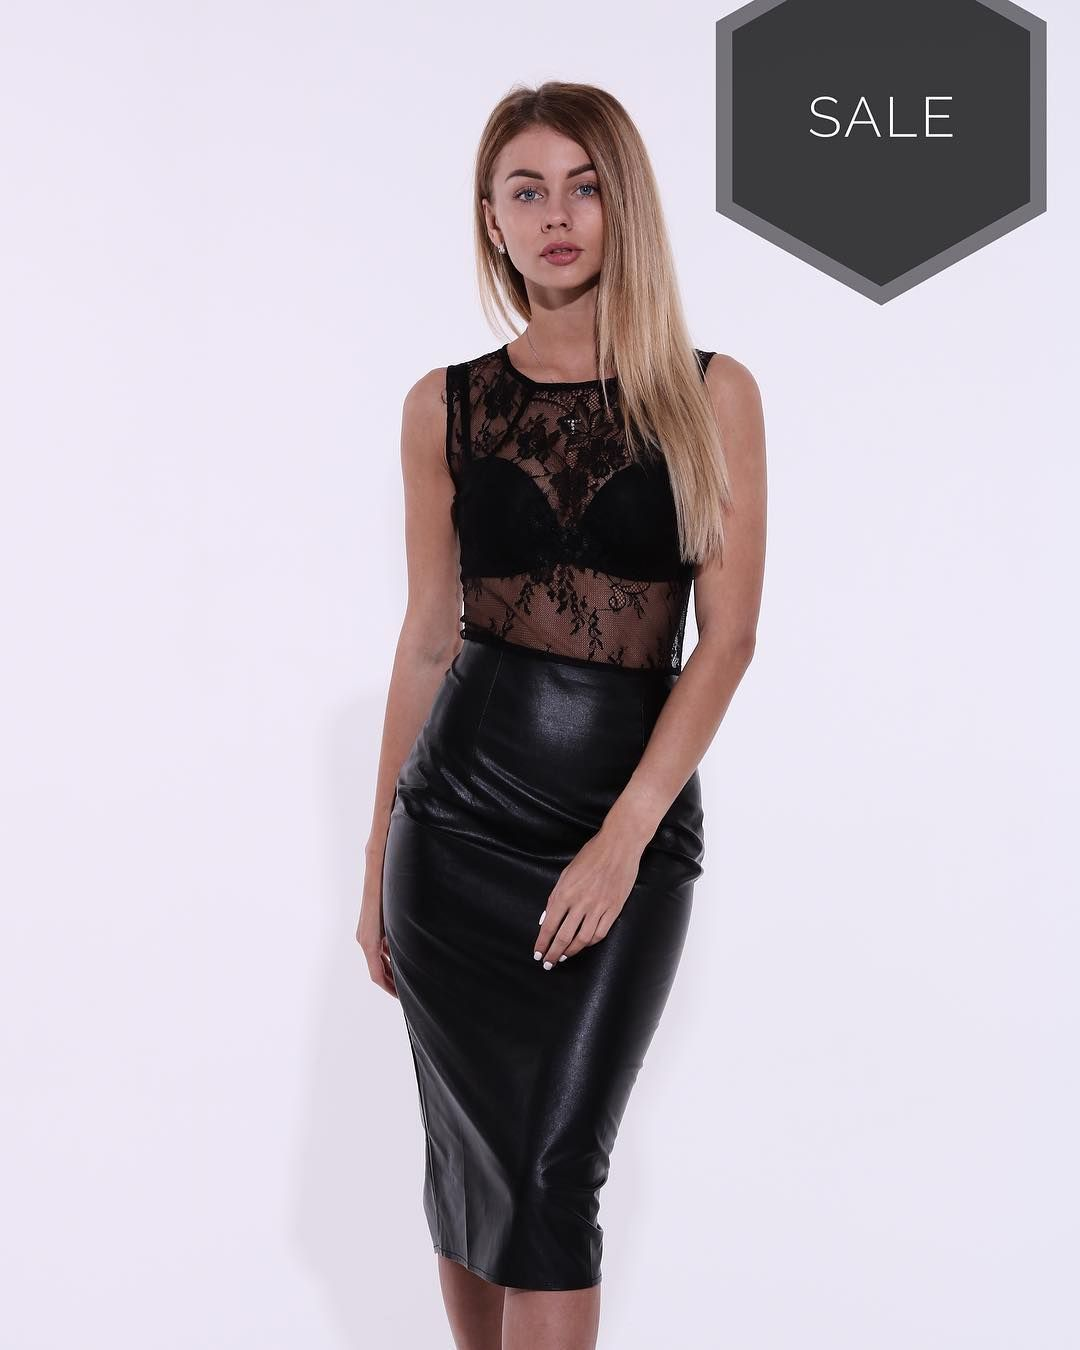 904496c814d Watch the Best YouTube Videos Online - SALE SALE SALEэффектное и  сексуальное платье от любимого московского